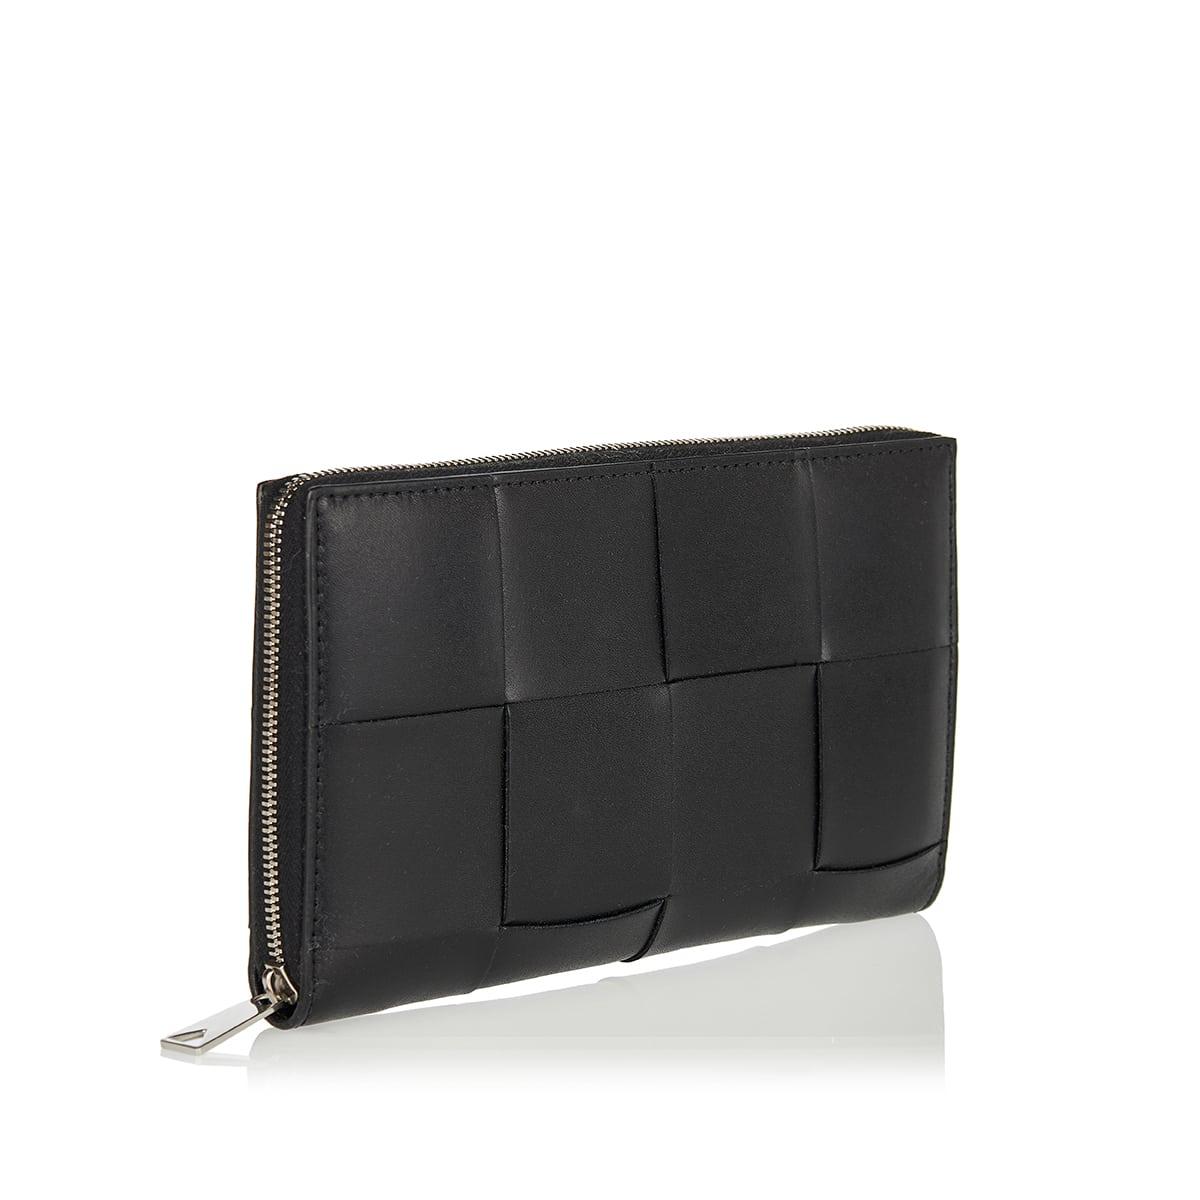 Leather woven zip-around wallet